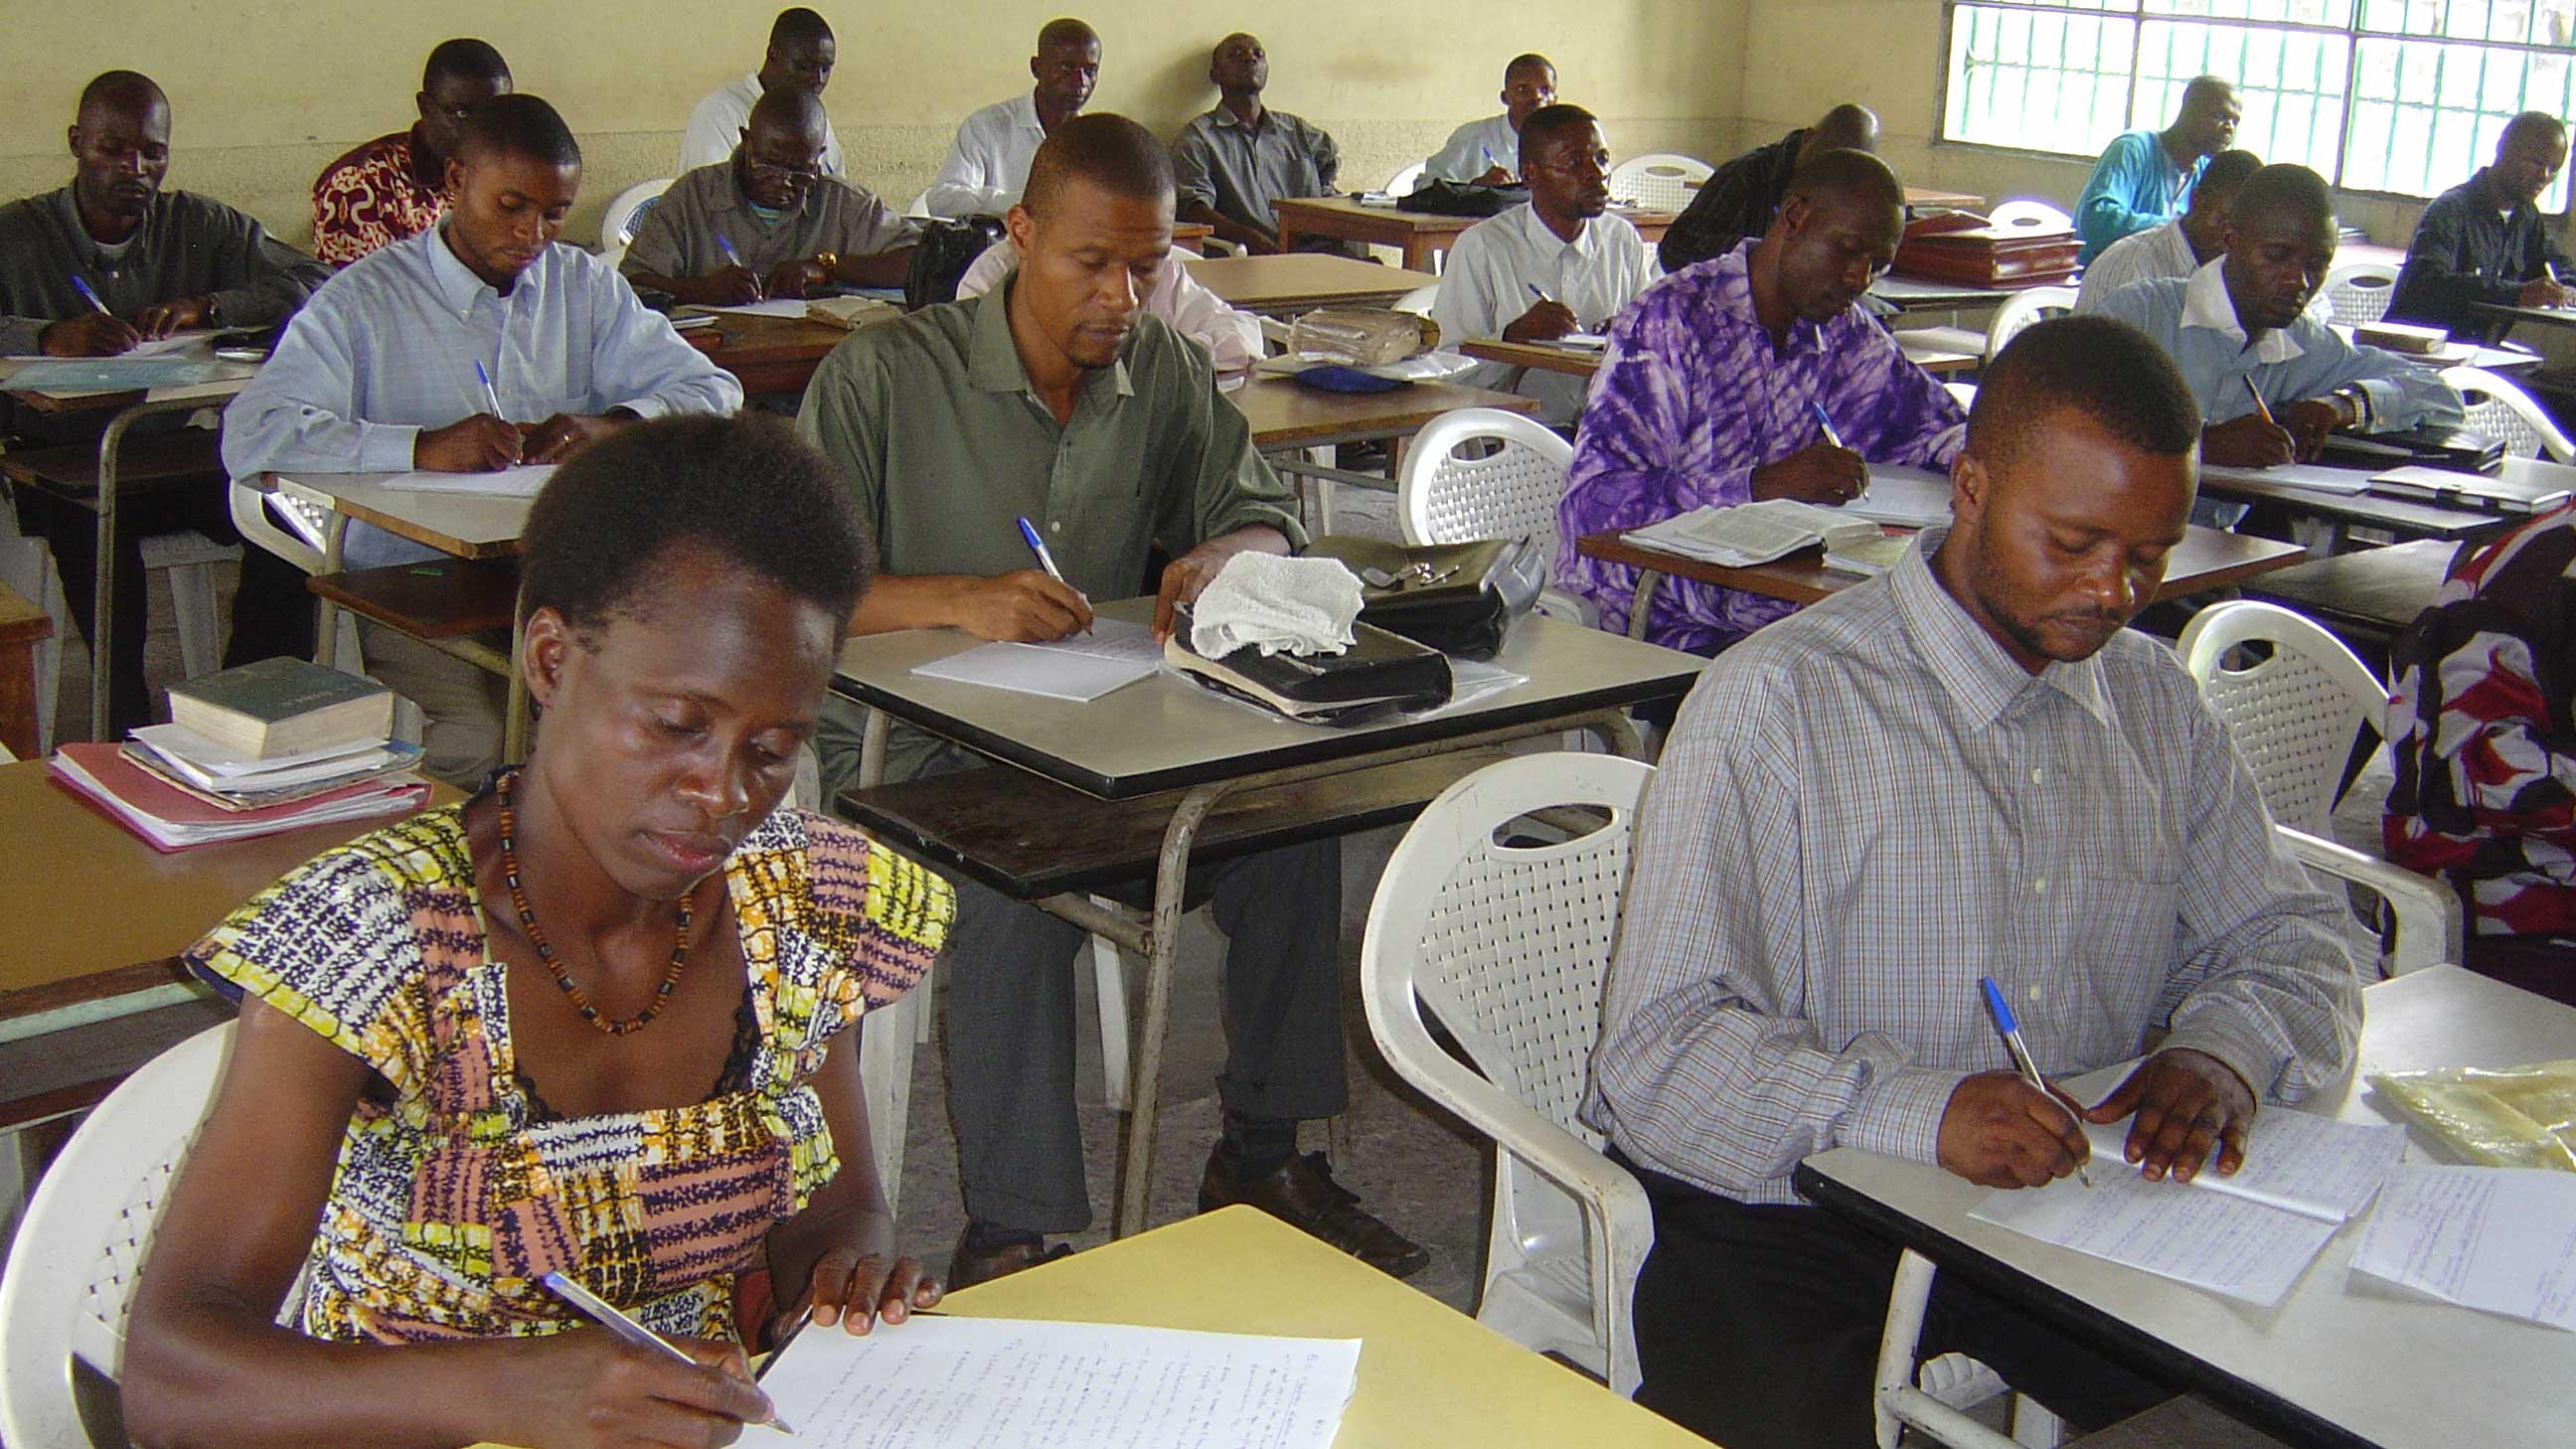 Kinshasa Bible School students